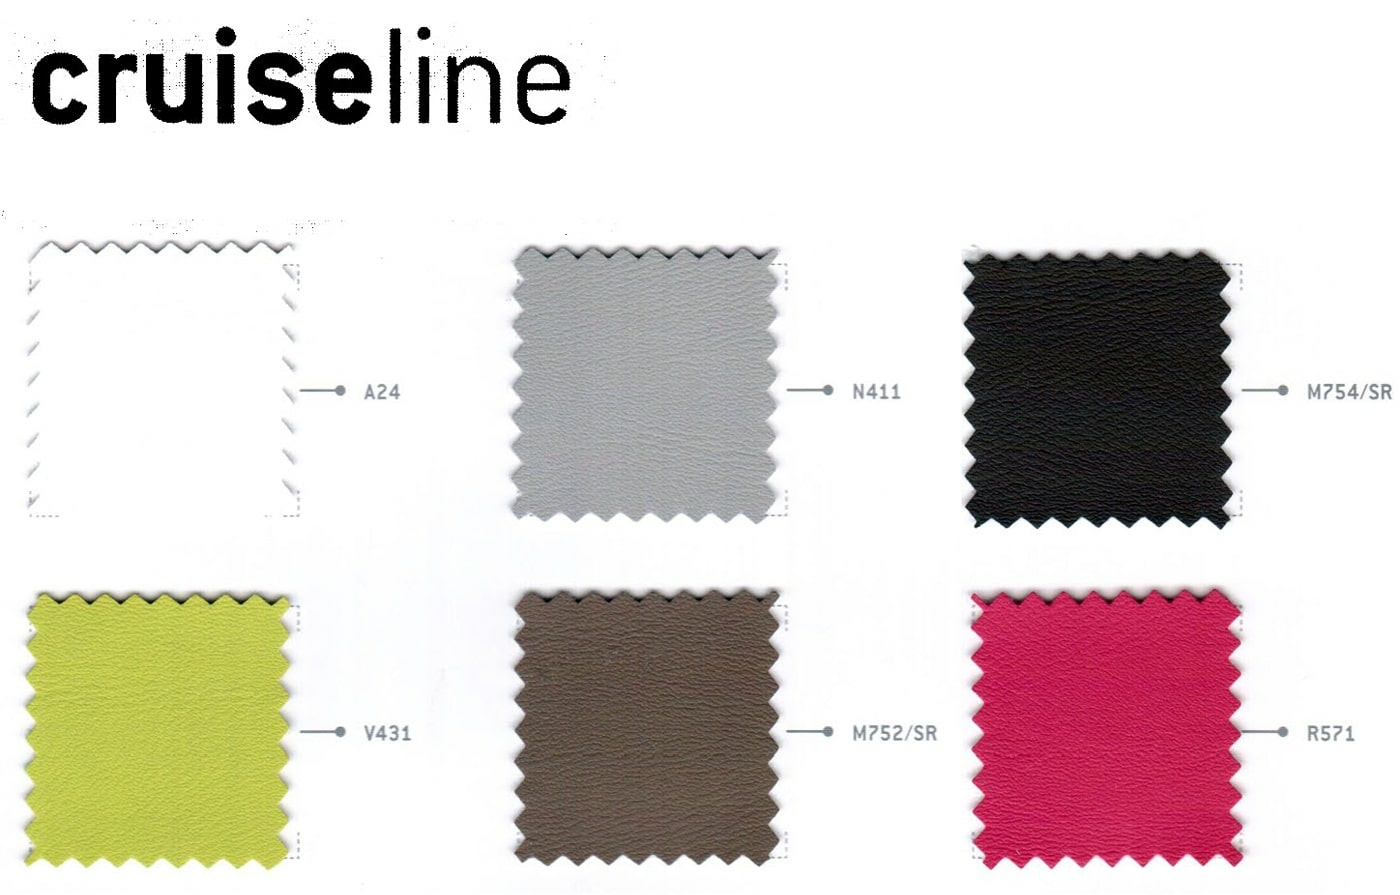 cruiseline-0-PM-min